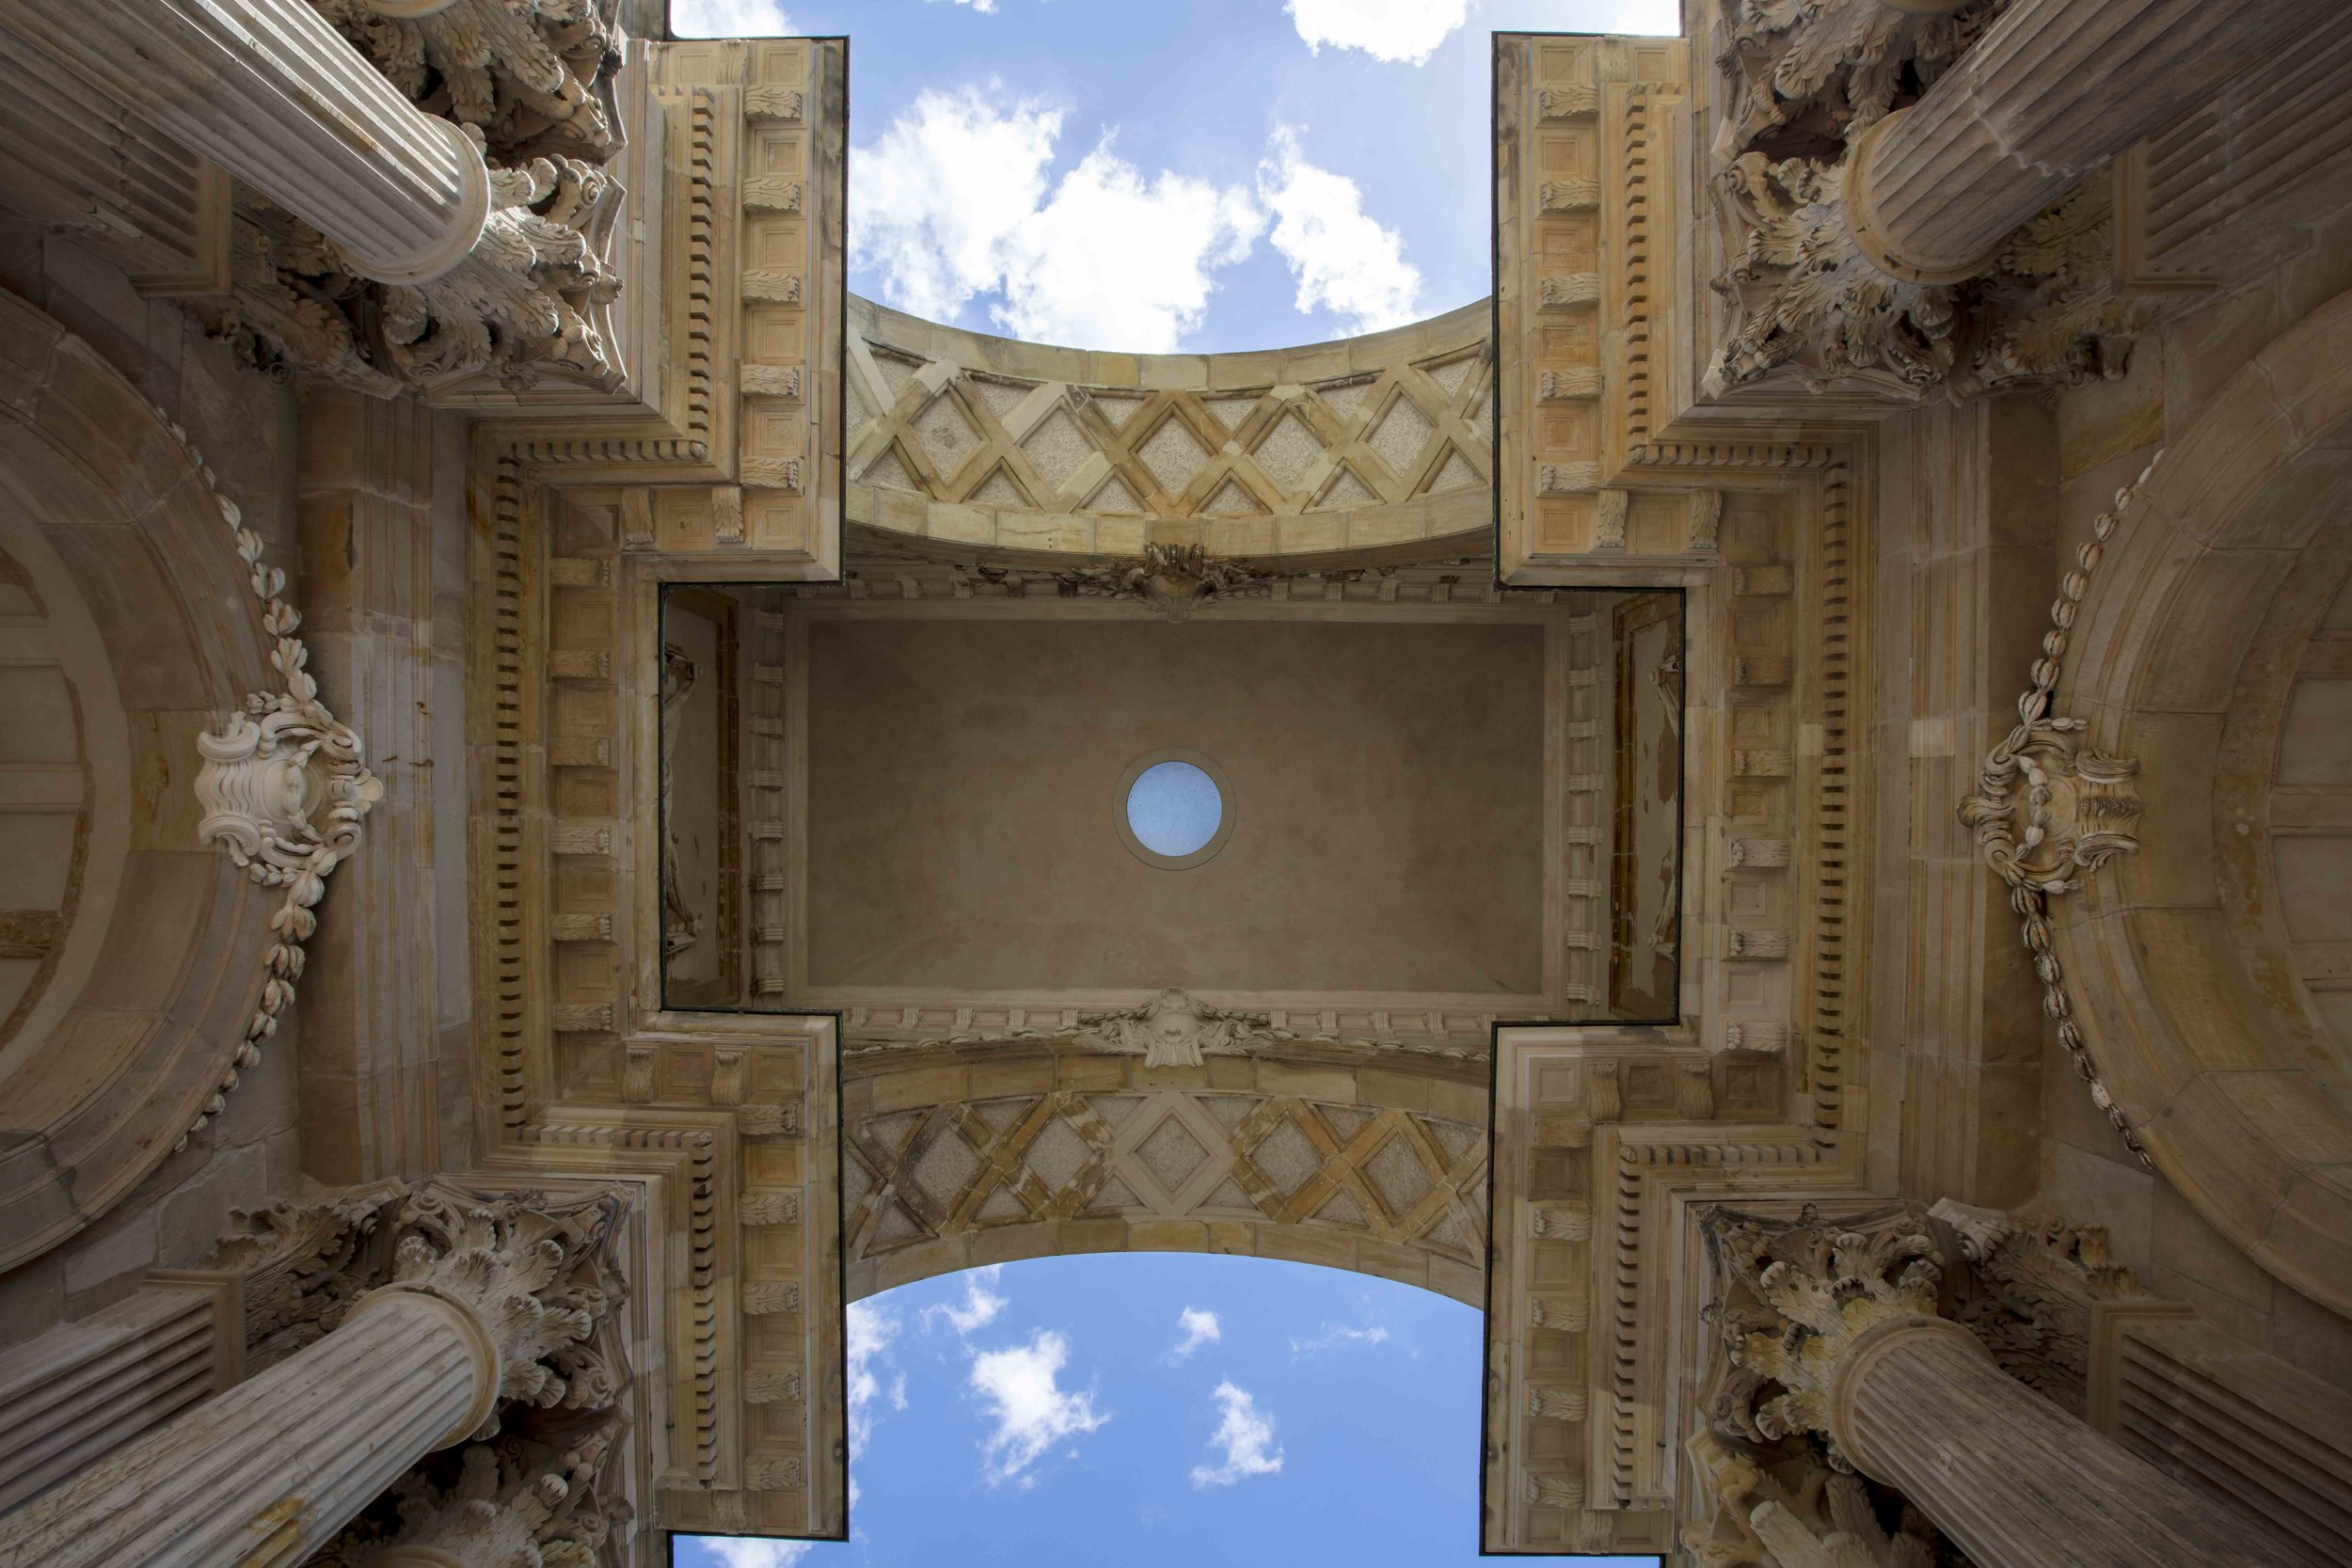 2017 07 Neues Palais Exterior Columns-5907.jpg